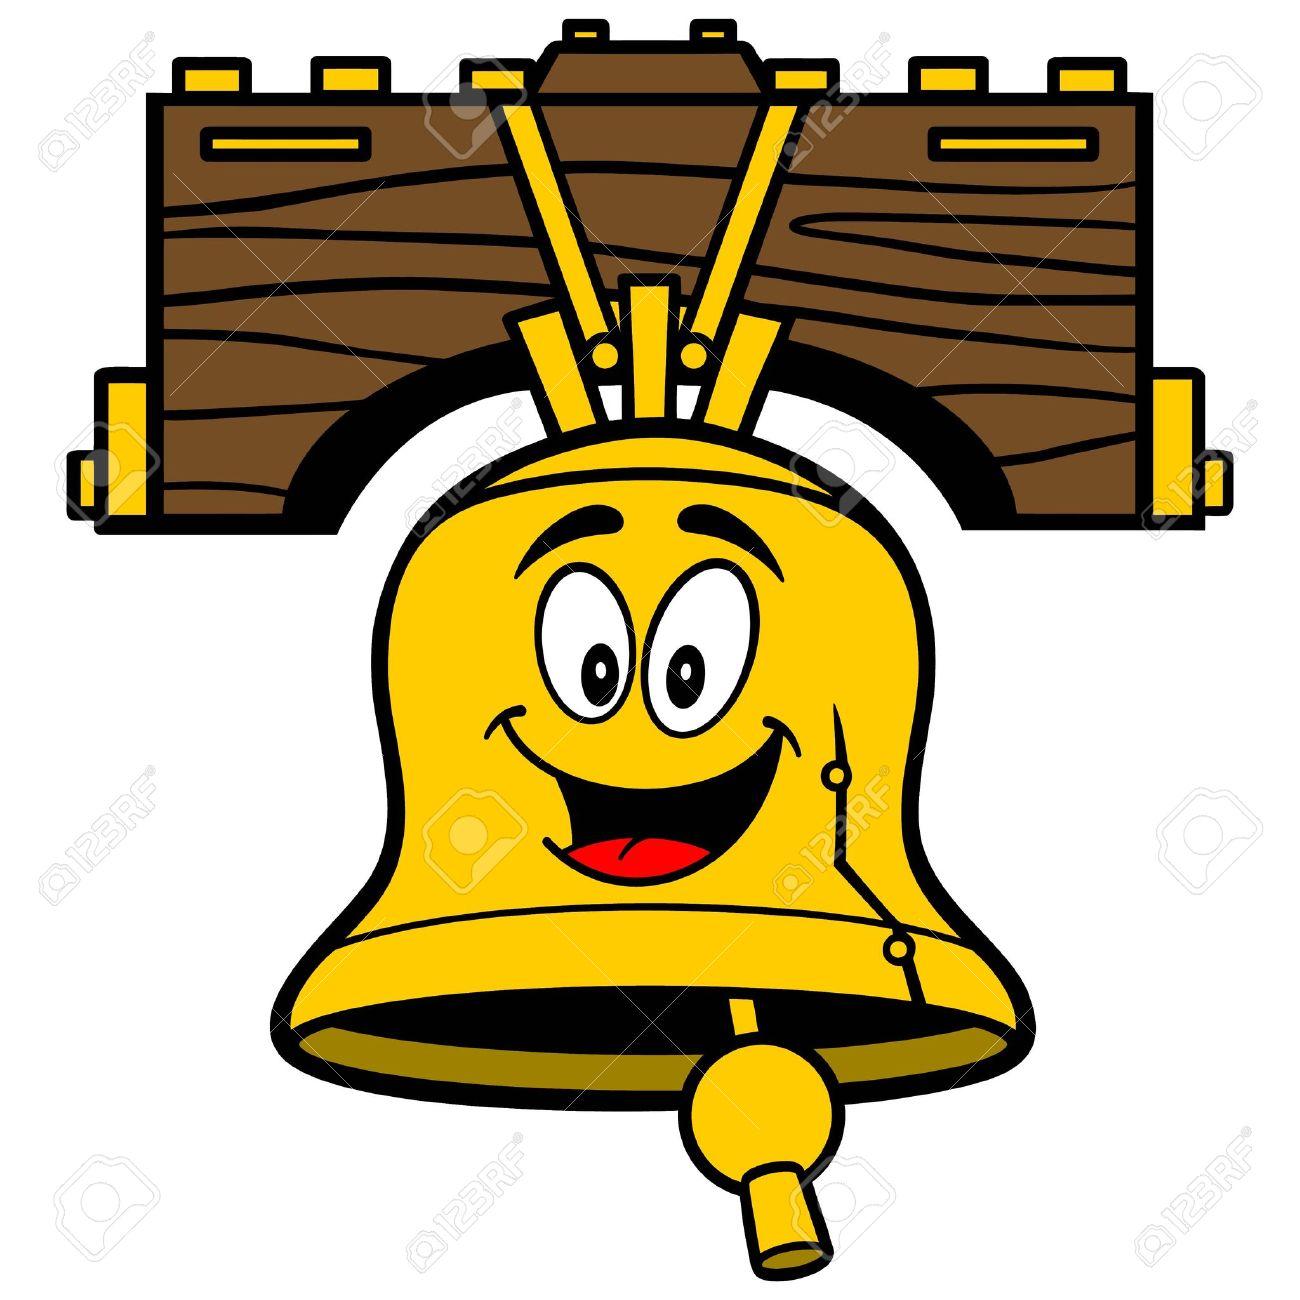 Liberty bell cartoon royalty free cliparts vectors and stock liberty bell cartoon biocorpaavc Images